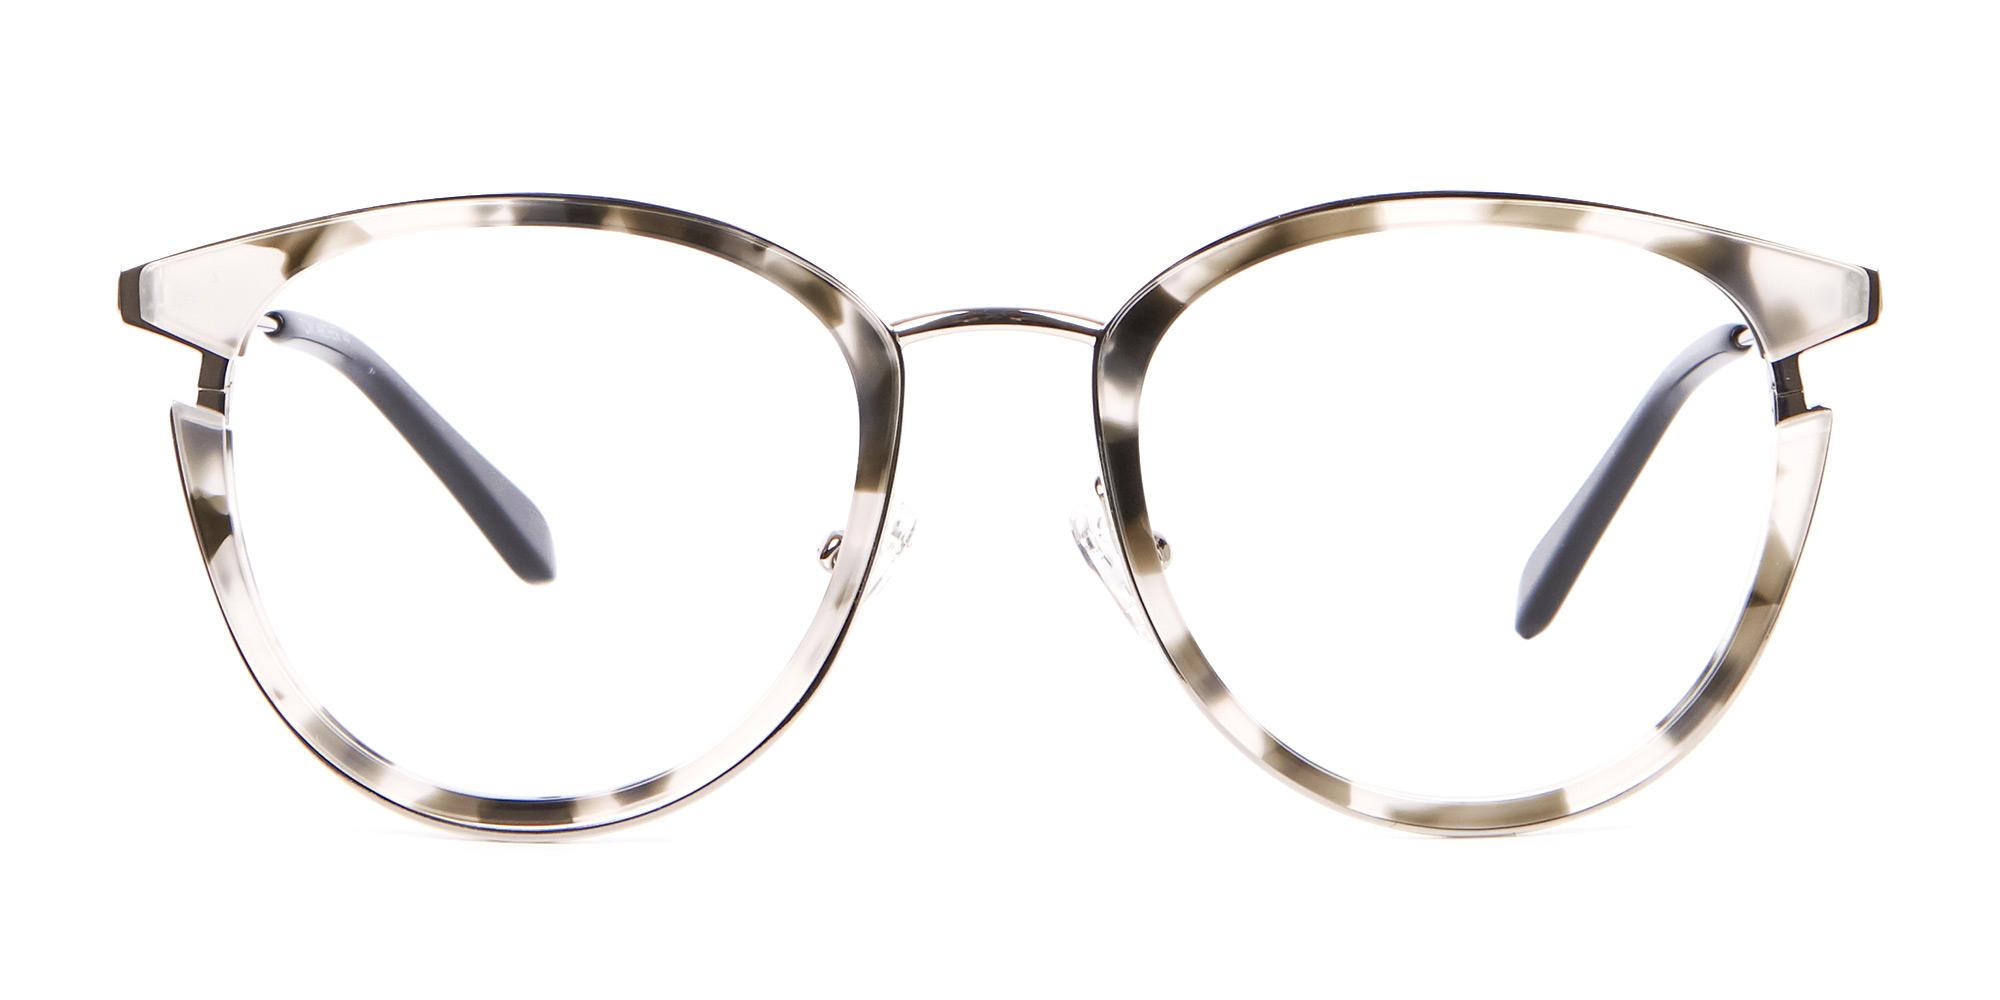 Grey Acetate Glasses in Round